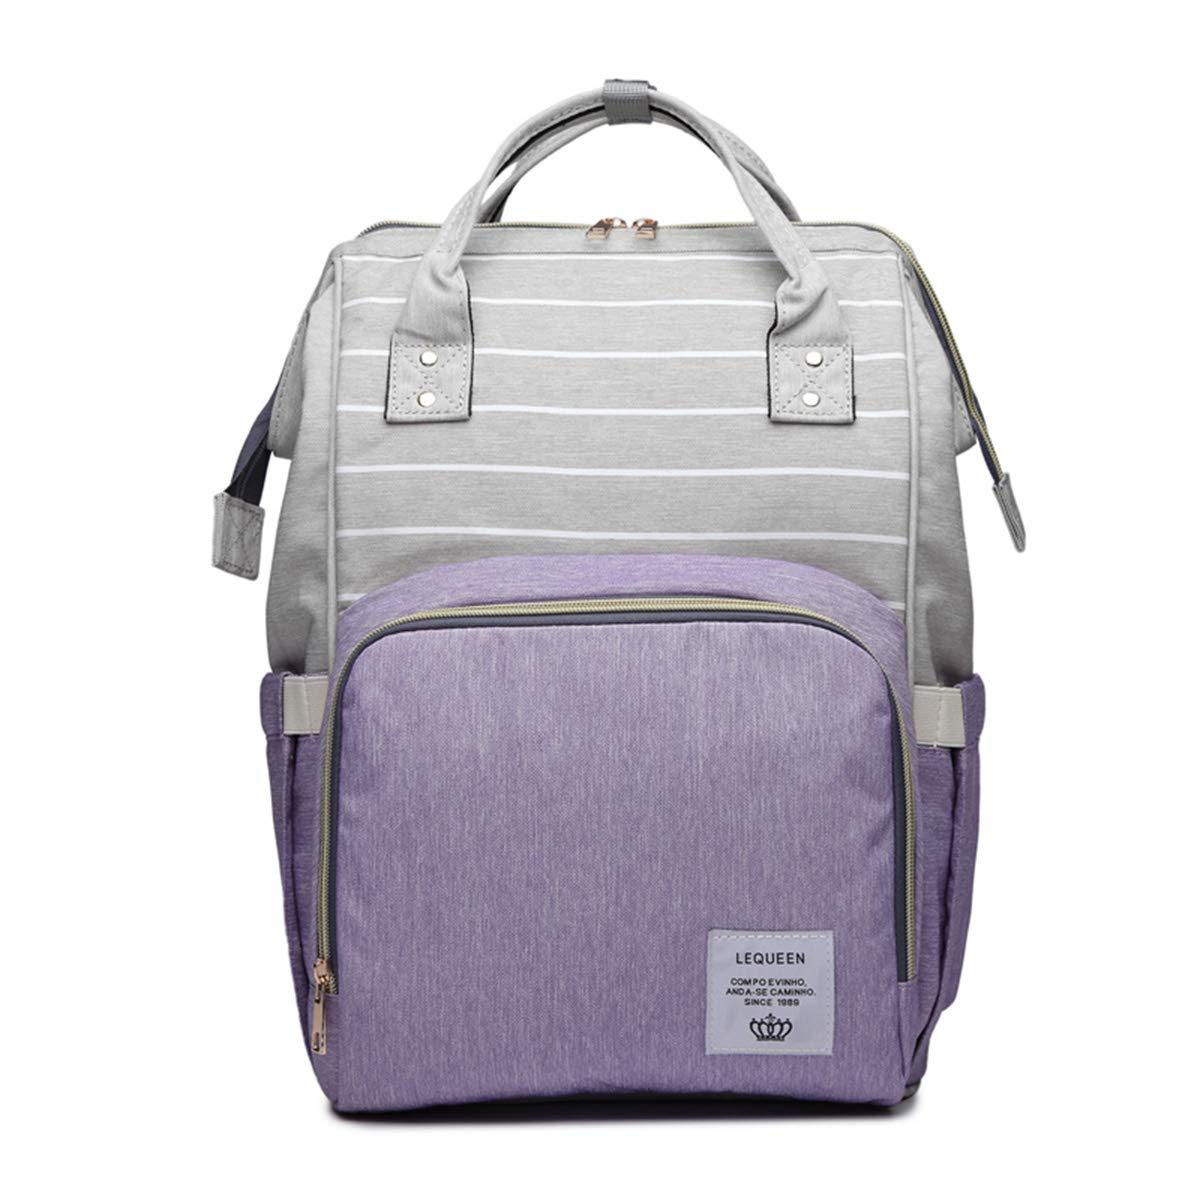 Mommy Maternity Stripe Nappy Diaper Backpack Travel Large Spacious Tote Shoulder Bag Nursing Organizer Bag (Grey+Purple)